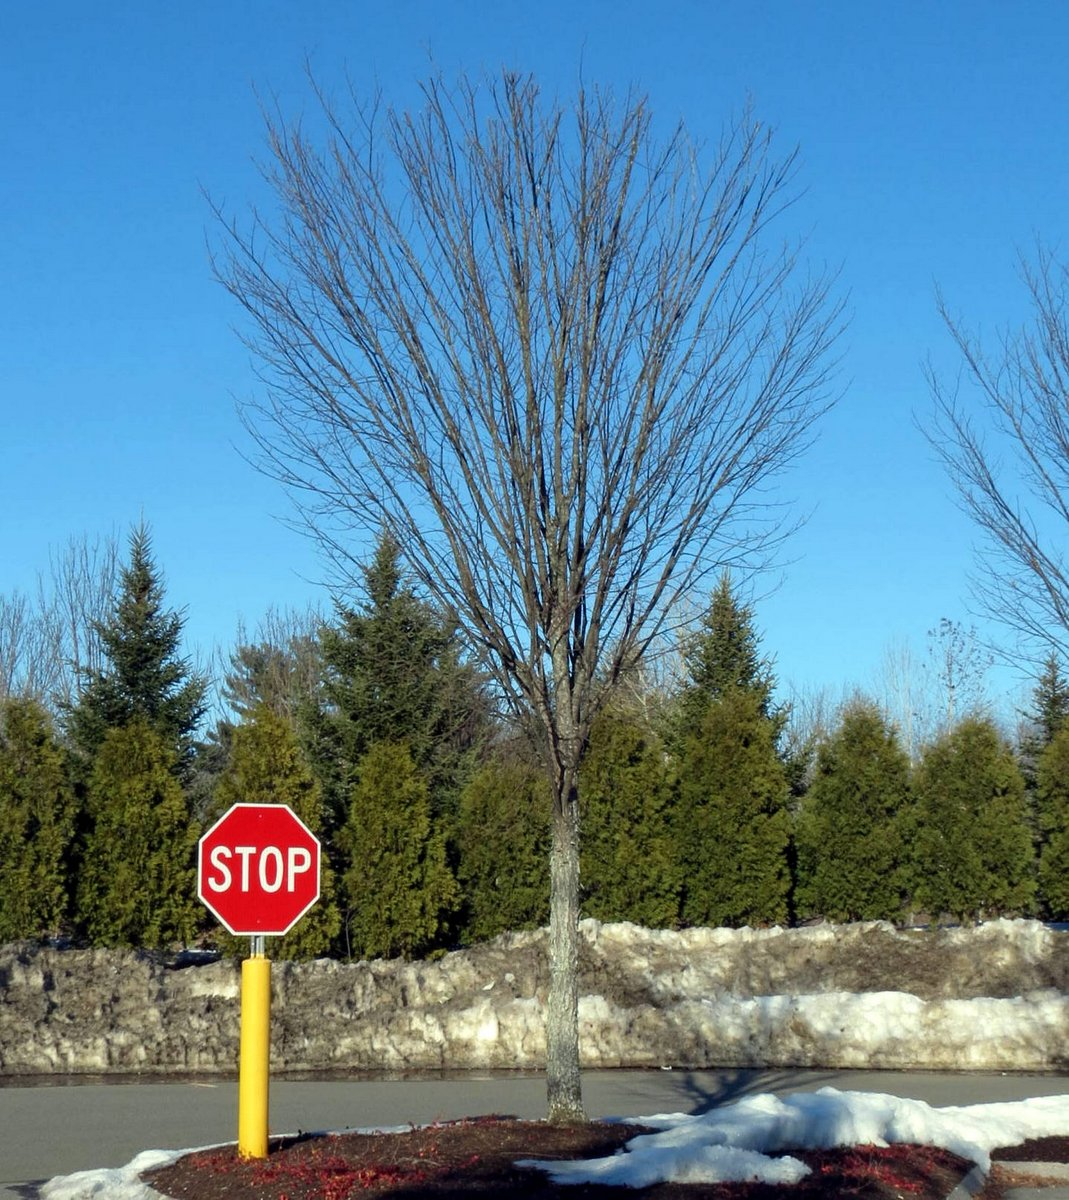 1. The Tree